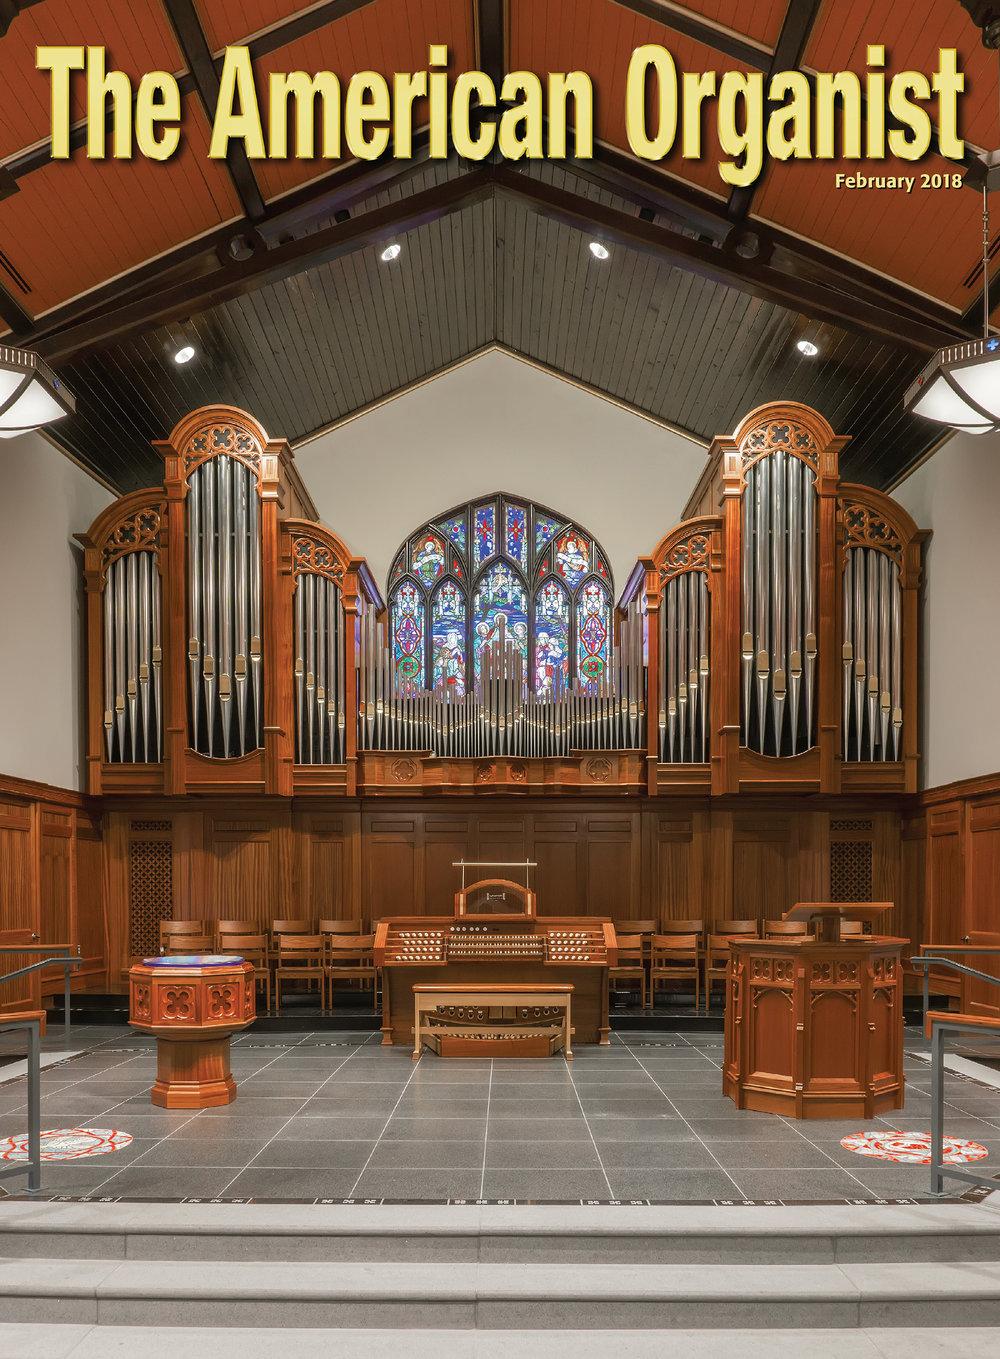 American Organist 2018, Shandon Presbyterian